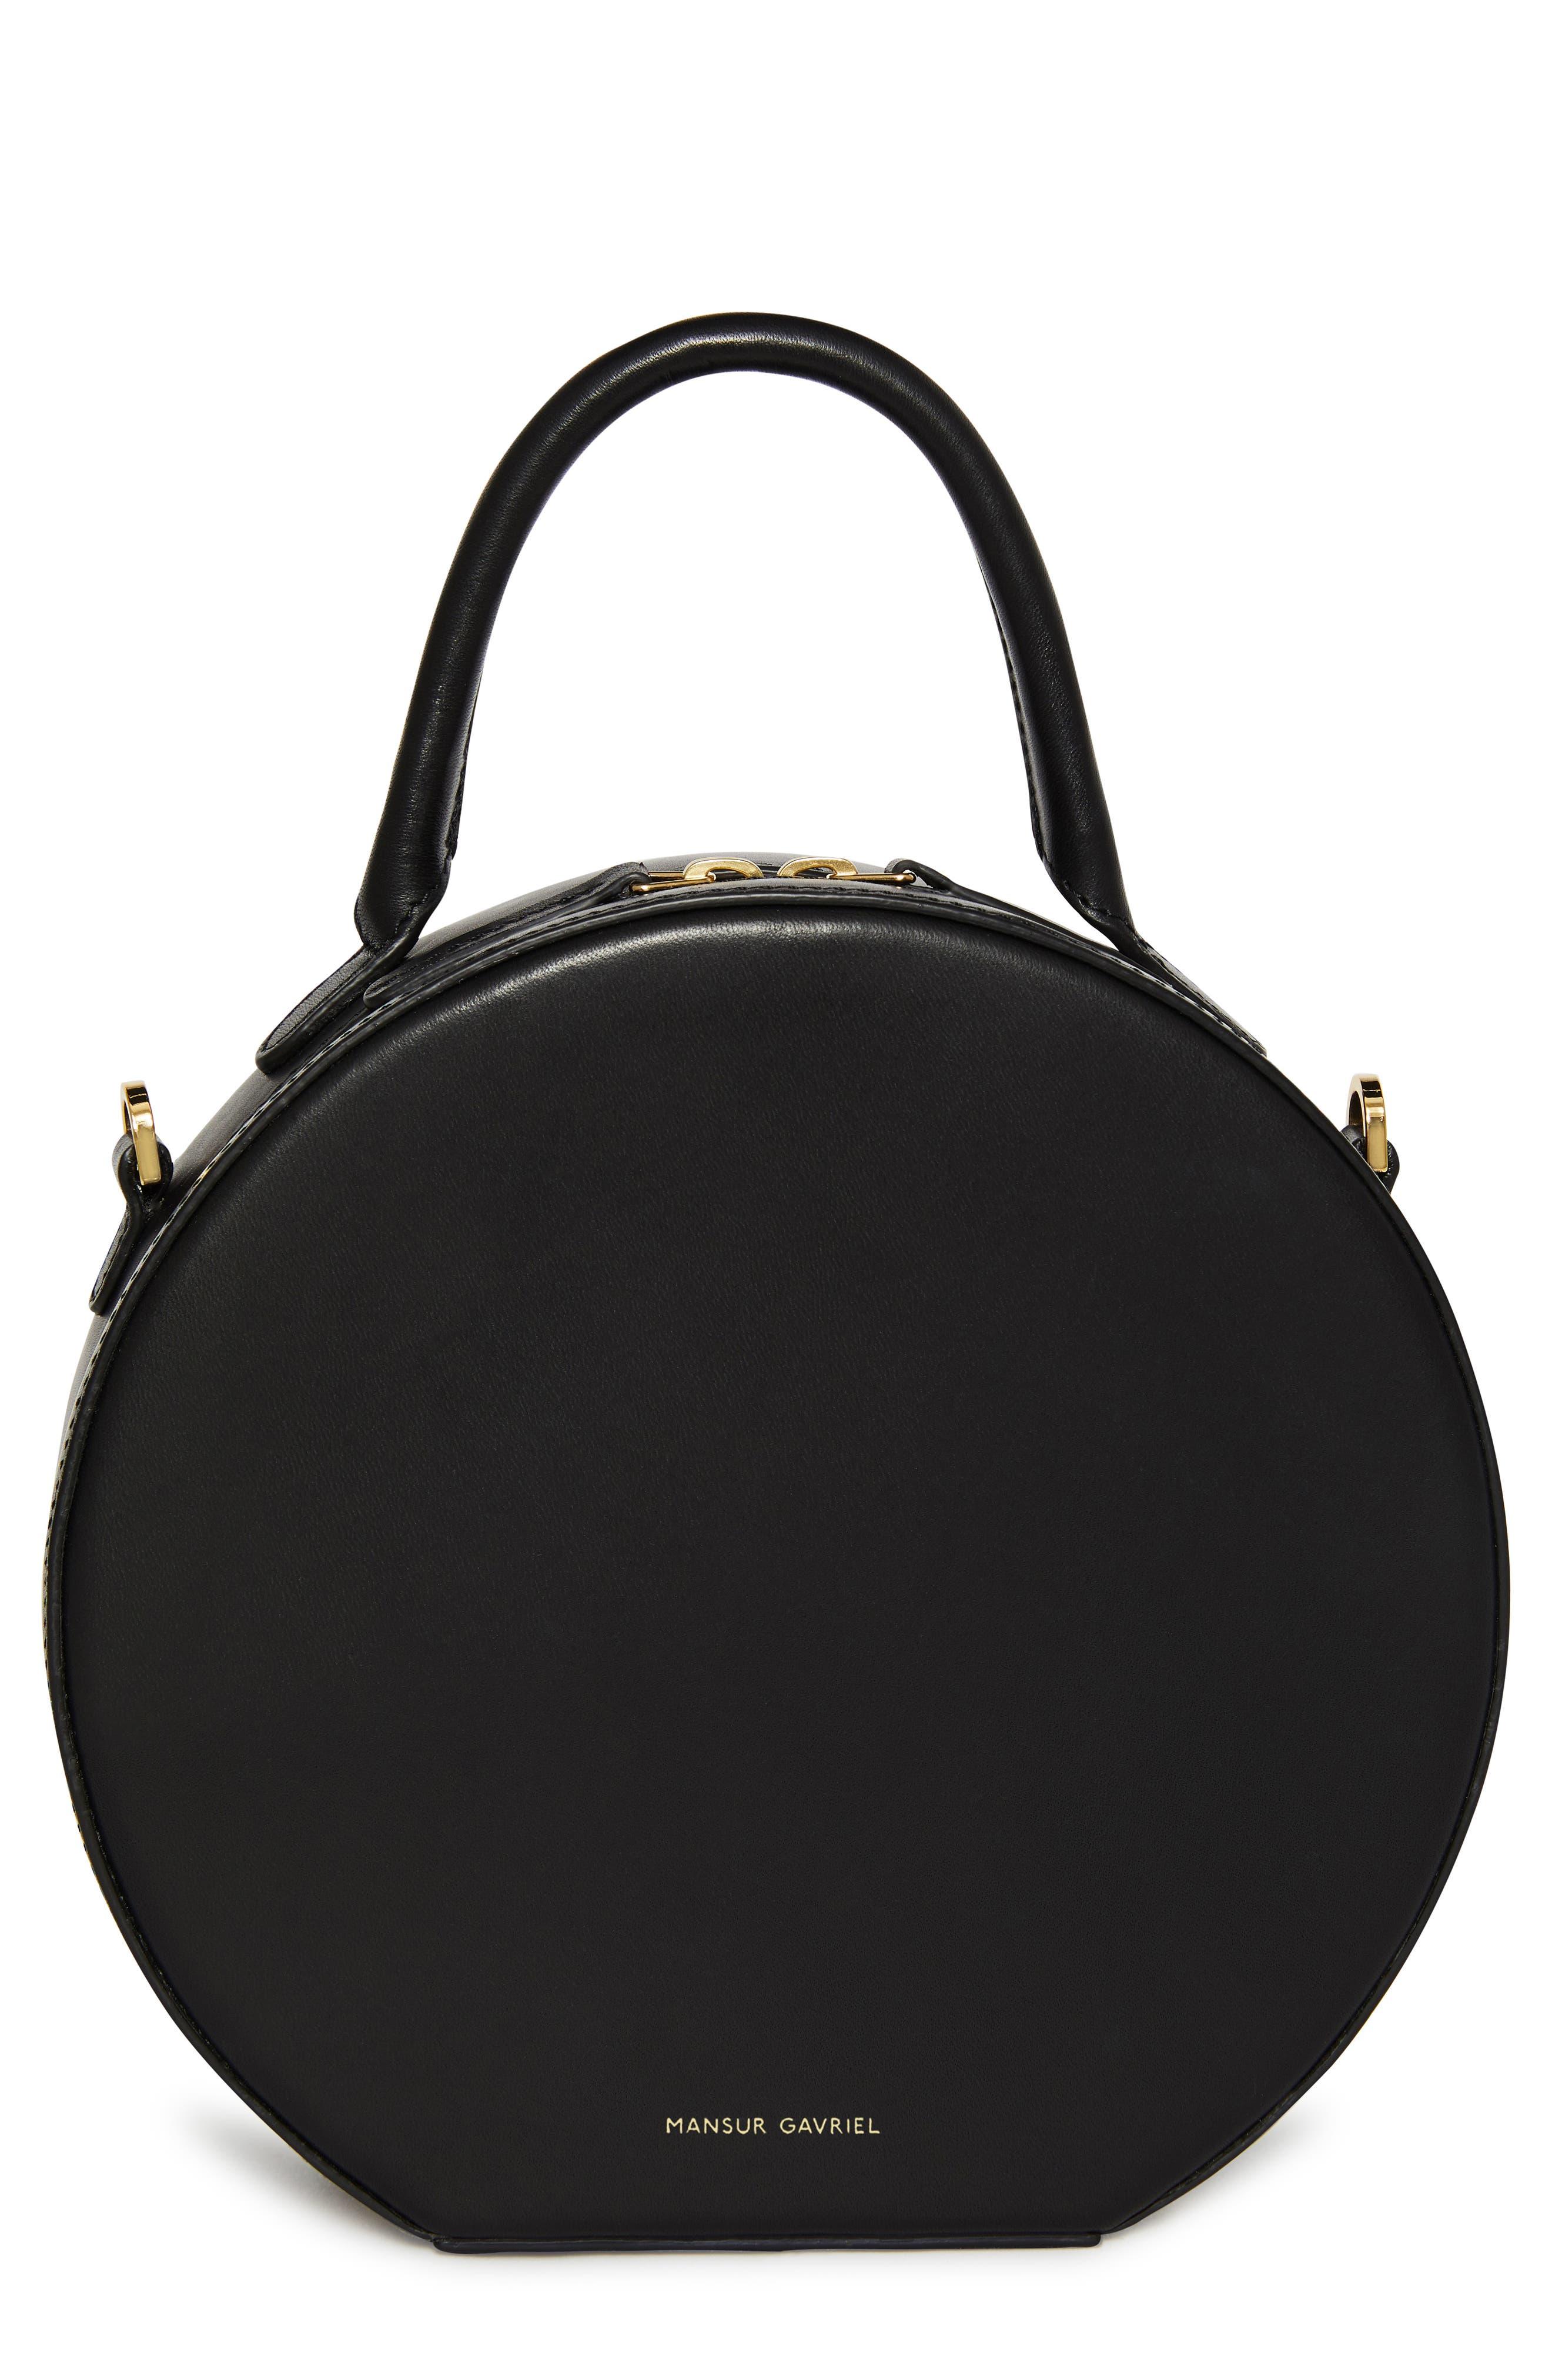 MANSUR GAVRIEL, Leather Circle Crossbody Bag, Main thumbnail 1, color, BLACK